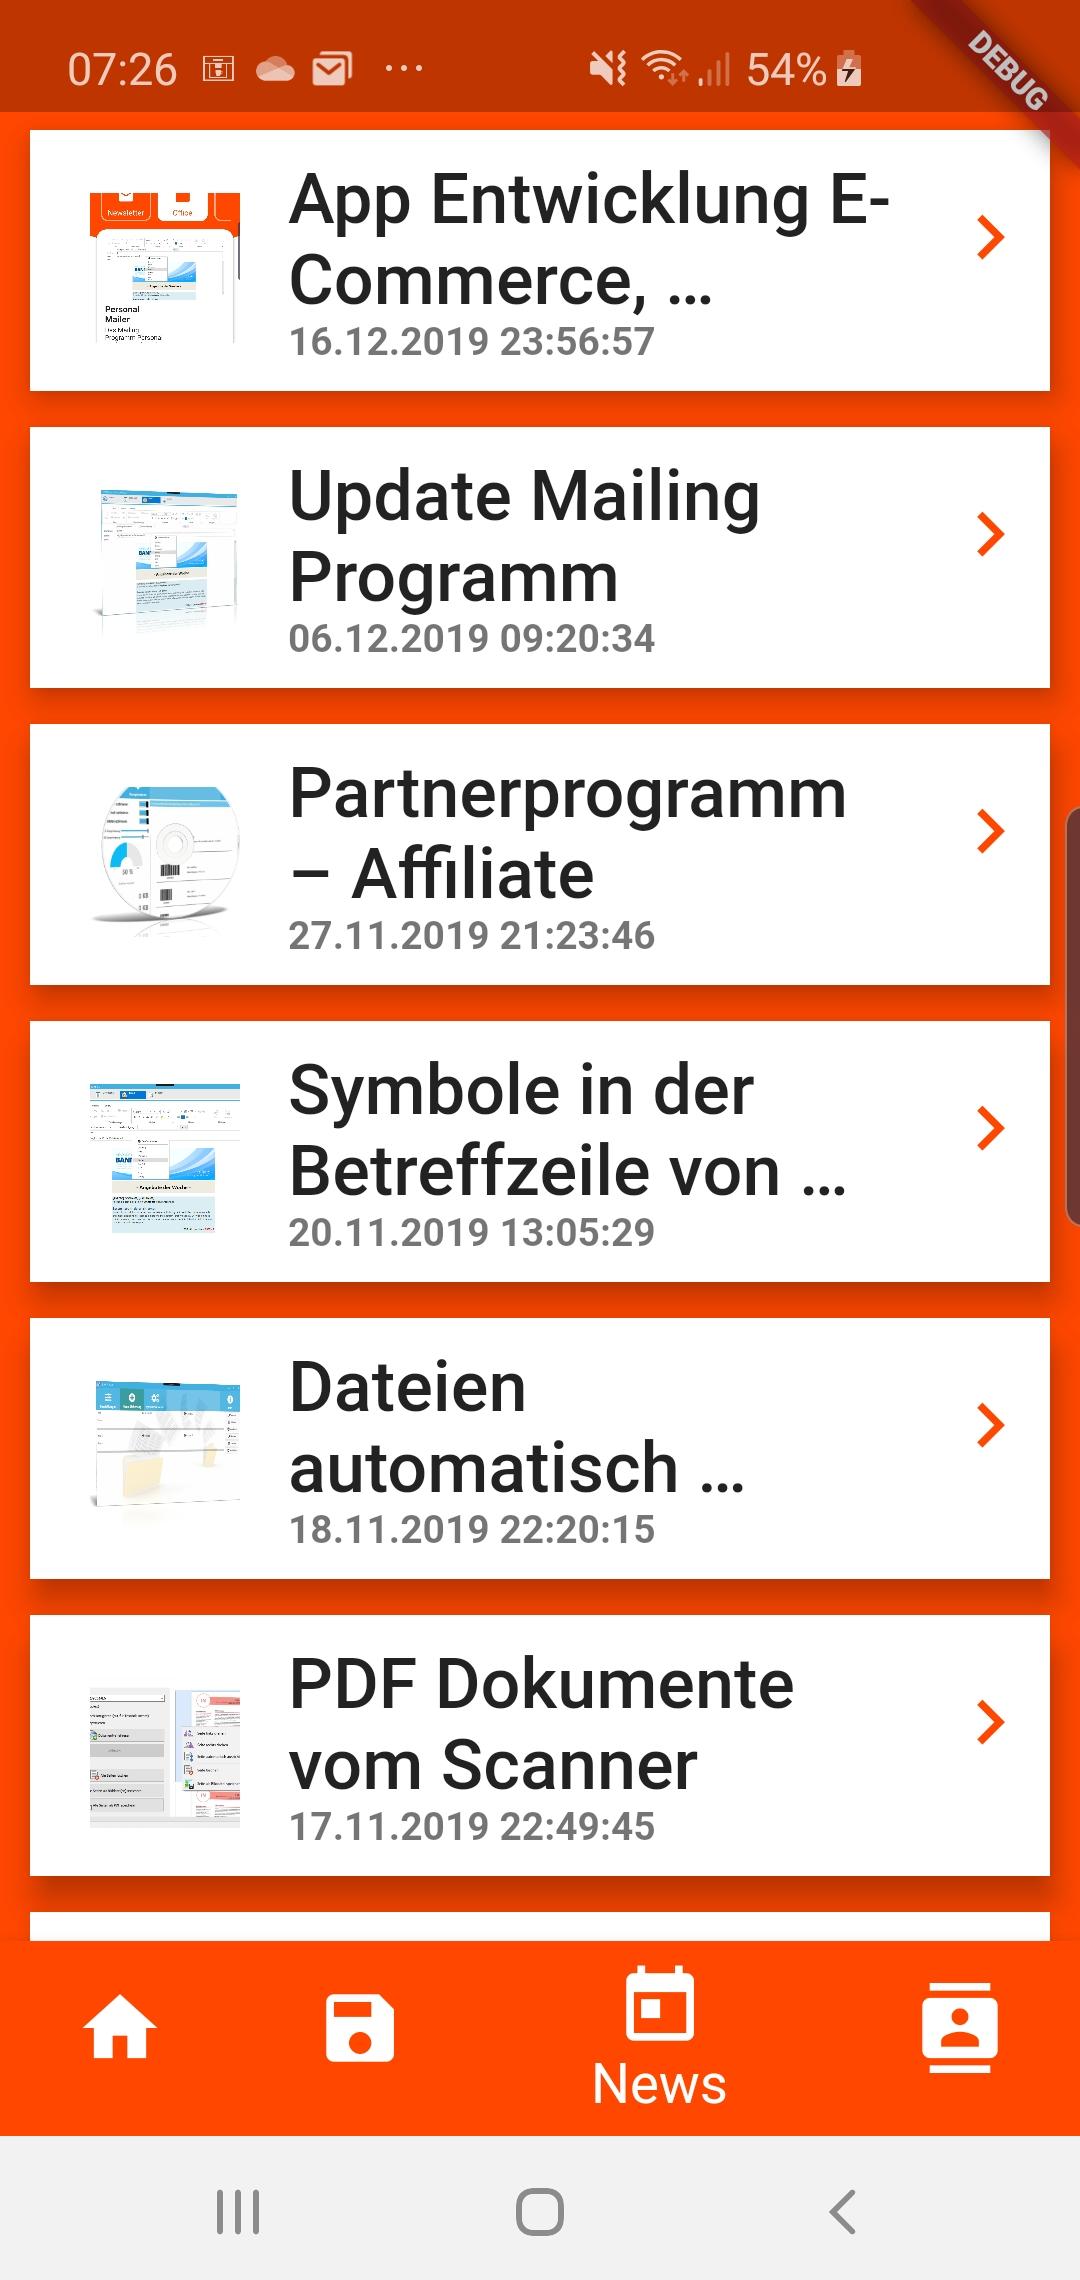 App Entwicklung E-Commerce, Shopping App 3